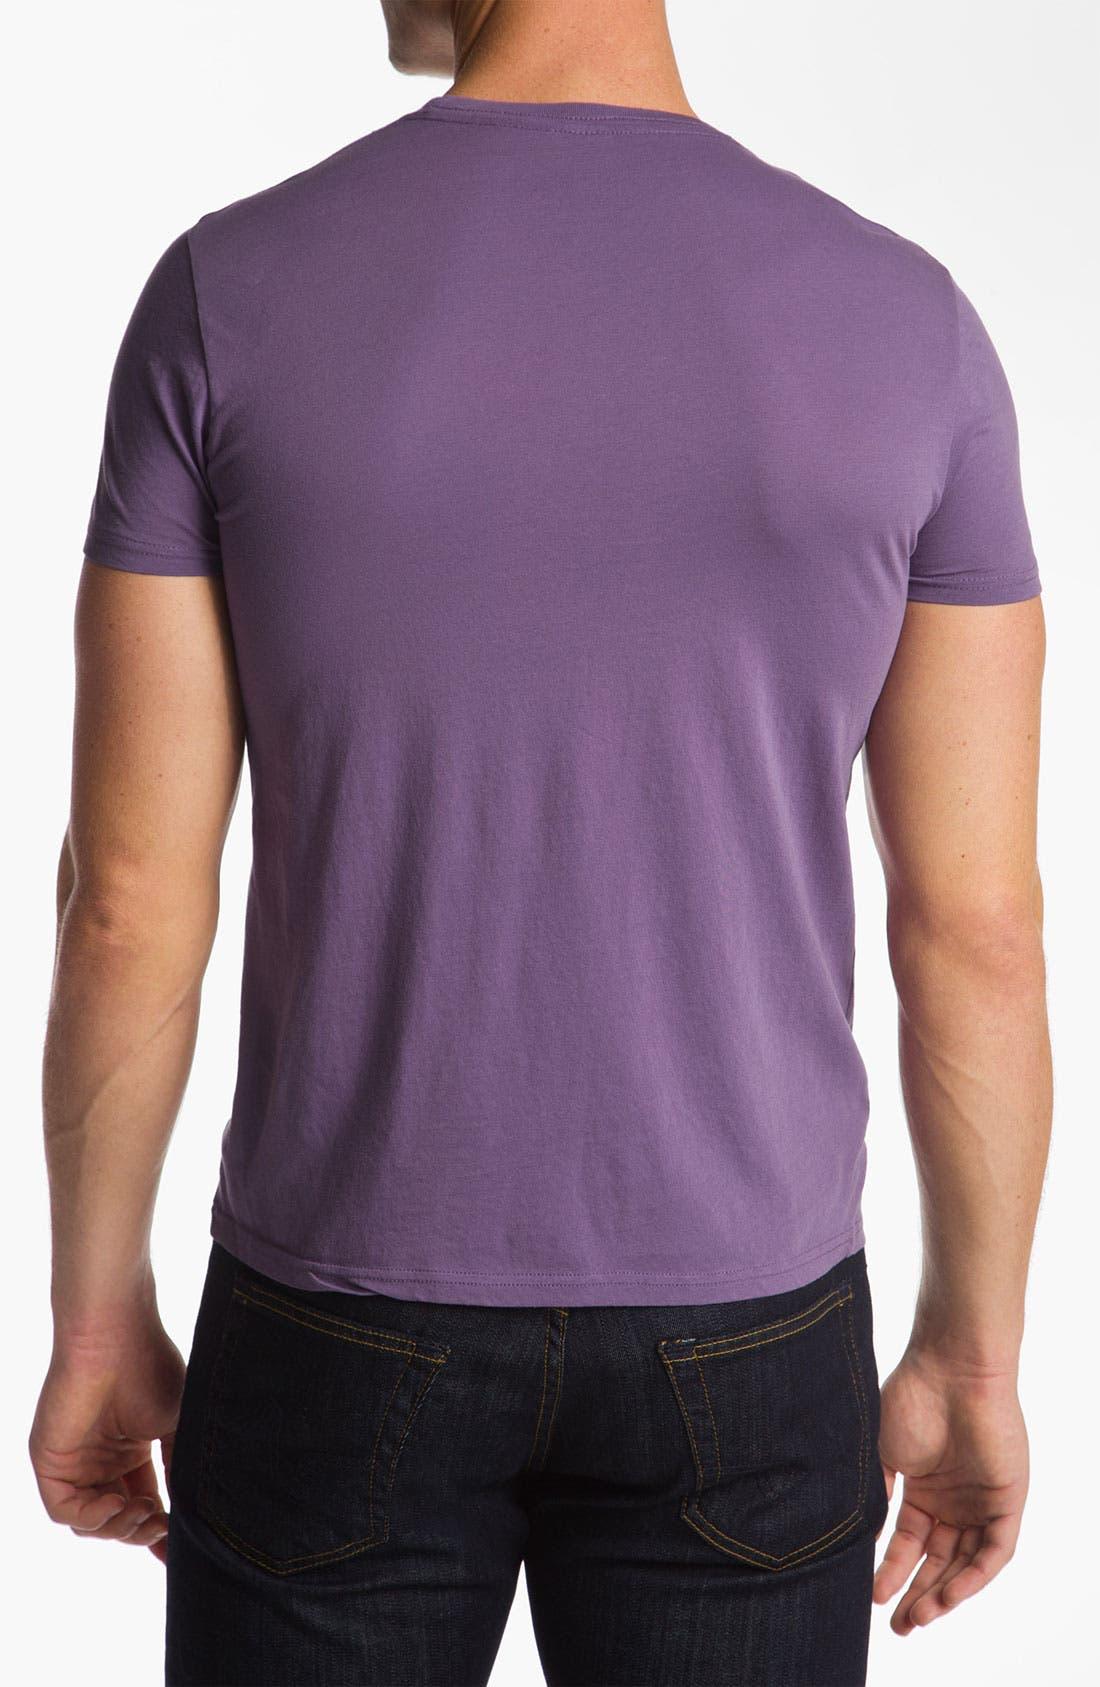 Alternate Image 2  - The Original Retro Brand 'Kansas State Wildcats' T-Shirt